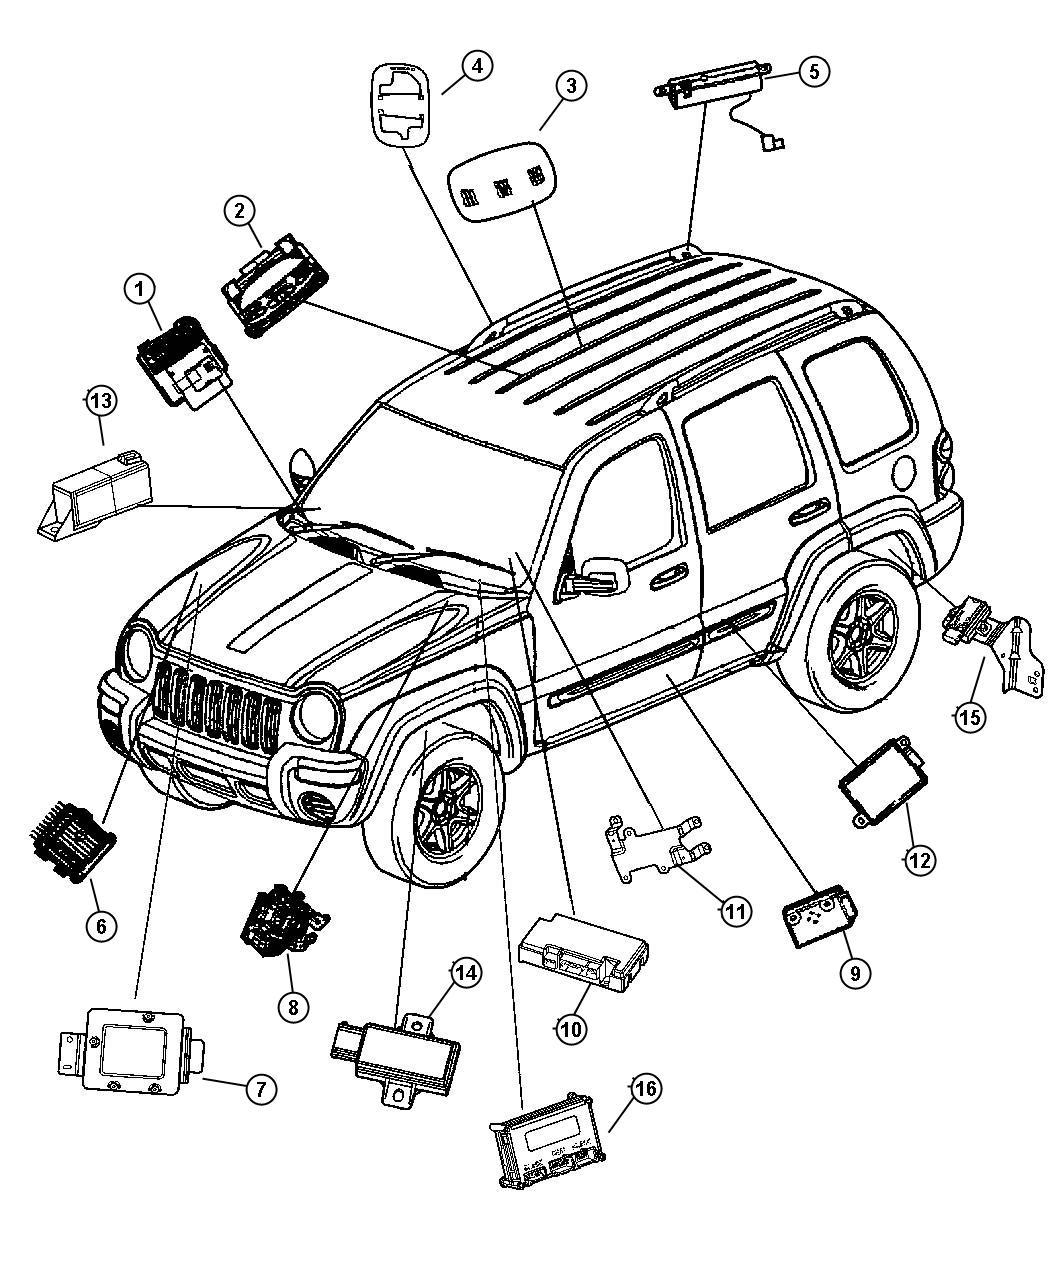 Jeep Liberty Antenna Fixed Lead Assembly